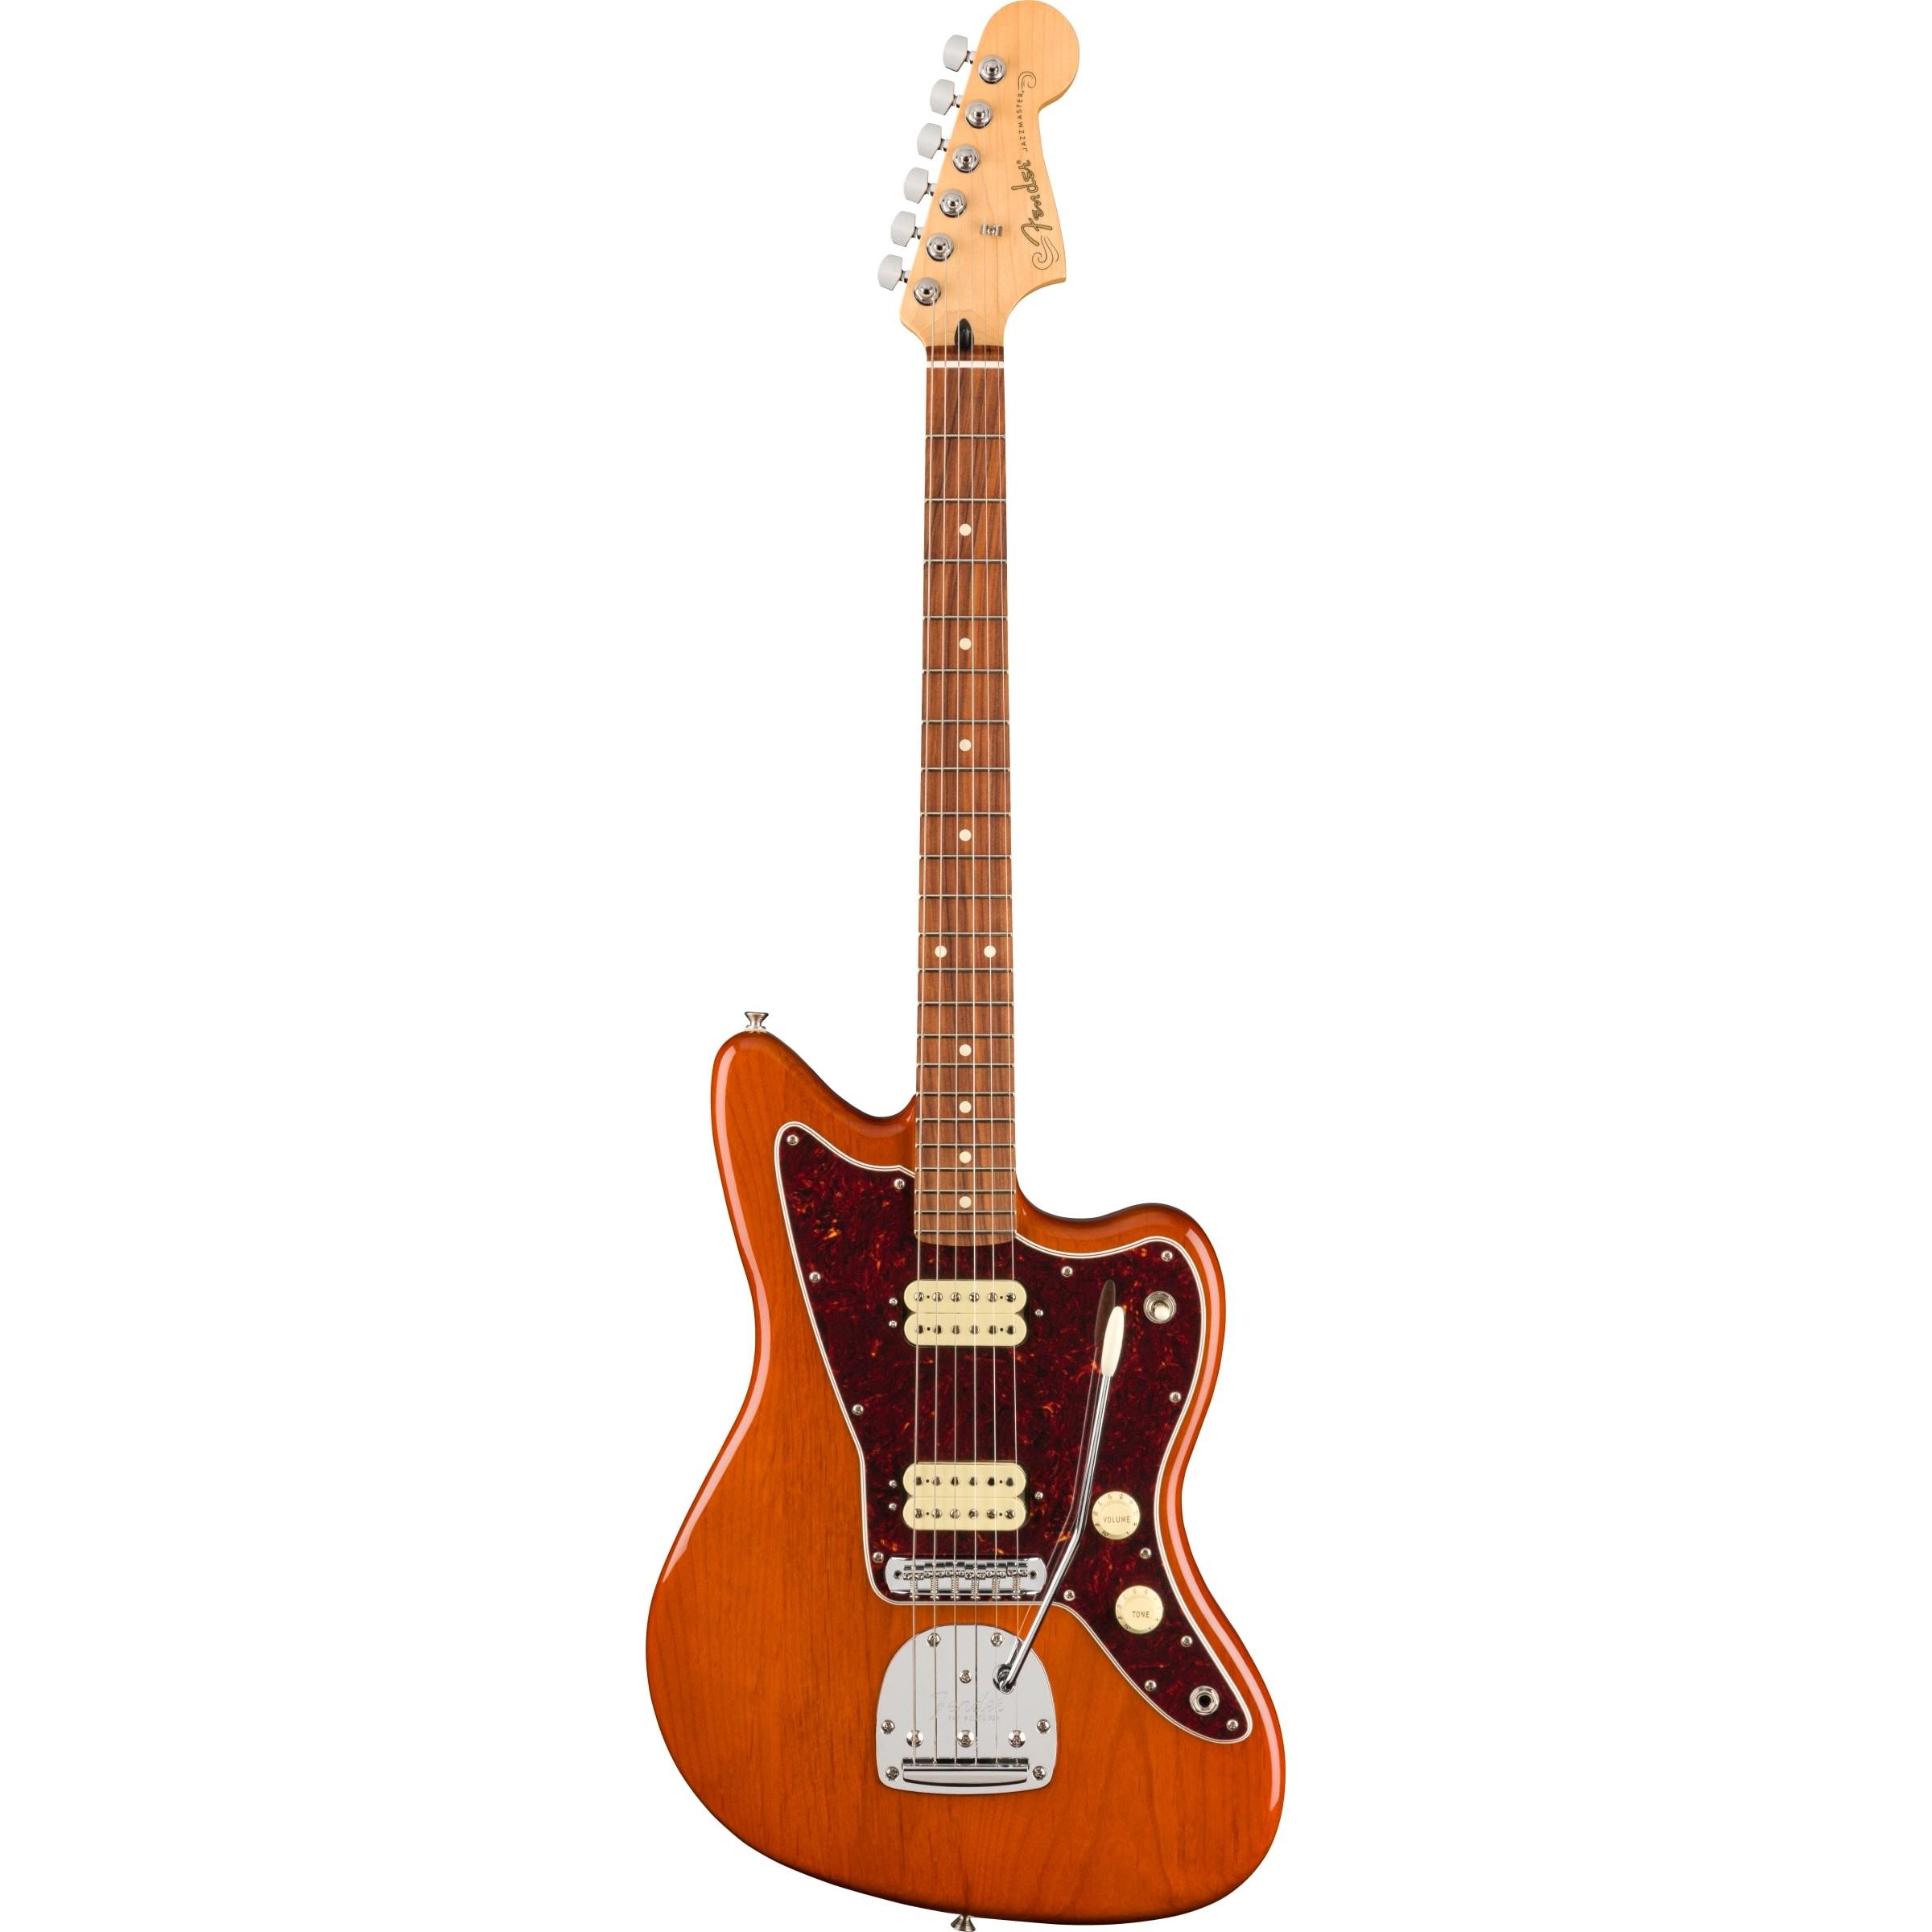 Fender Player Jazzmaster Aged Natural PF Limited Edition Electric Guitar - £519 delivered @ bax-shop